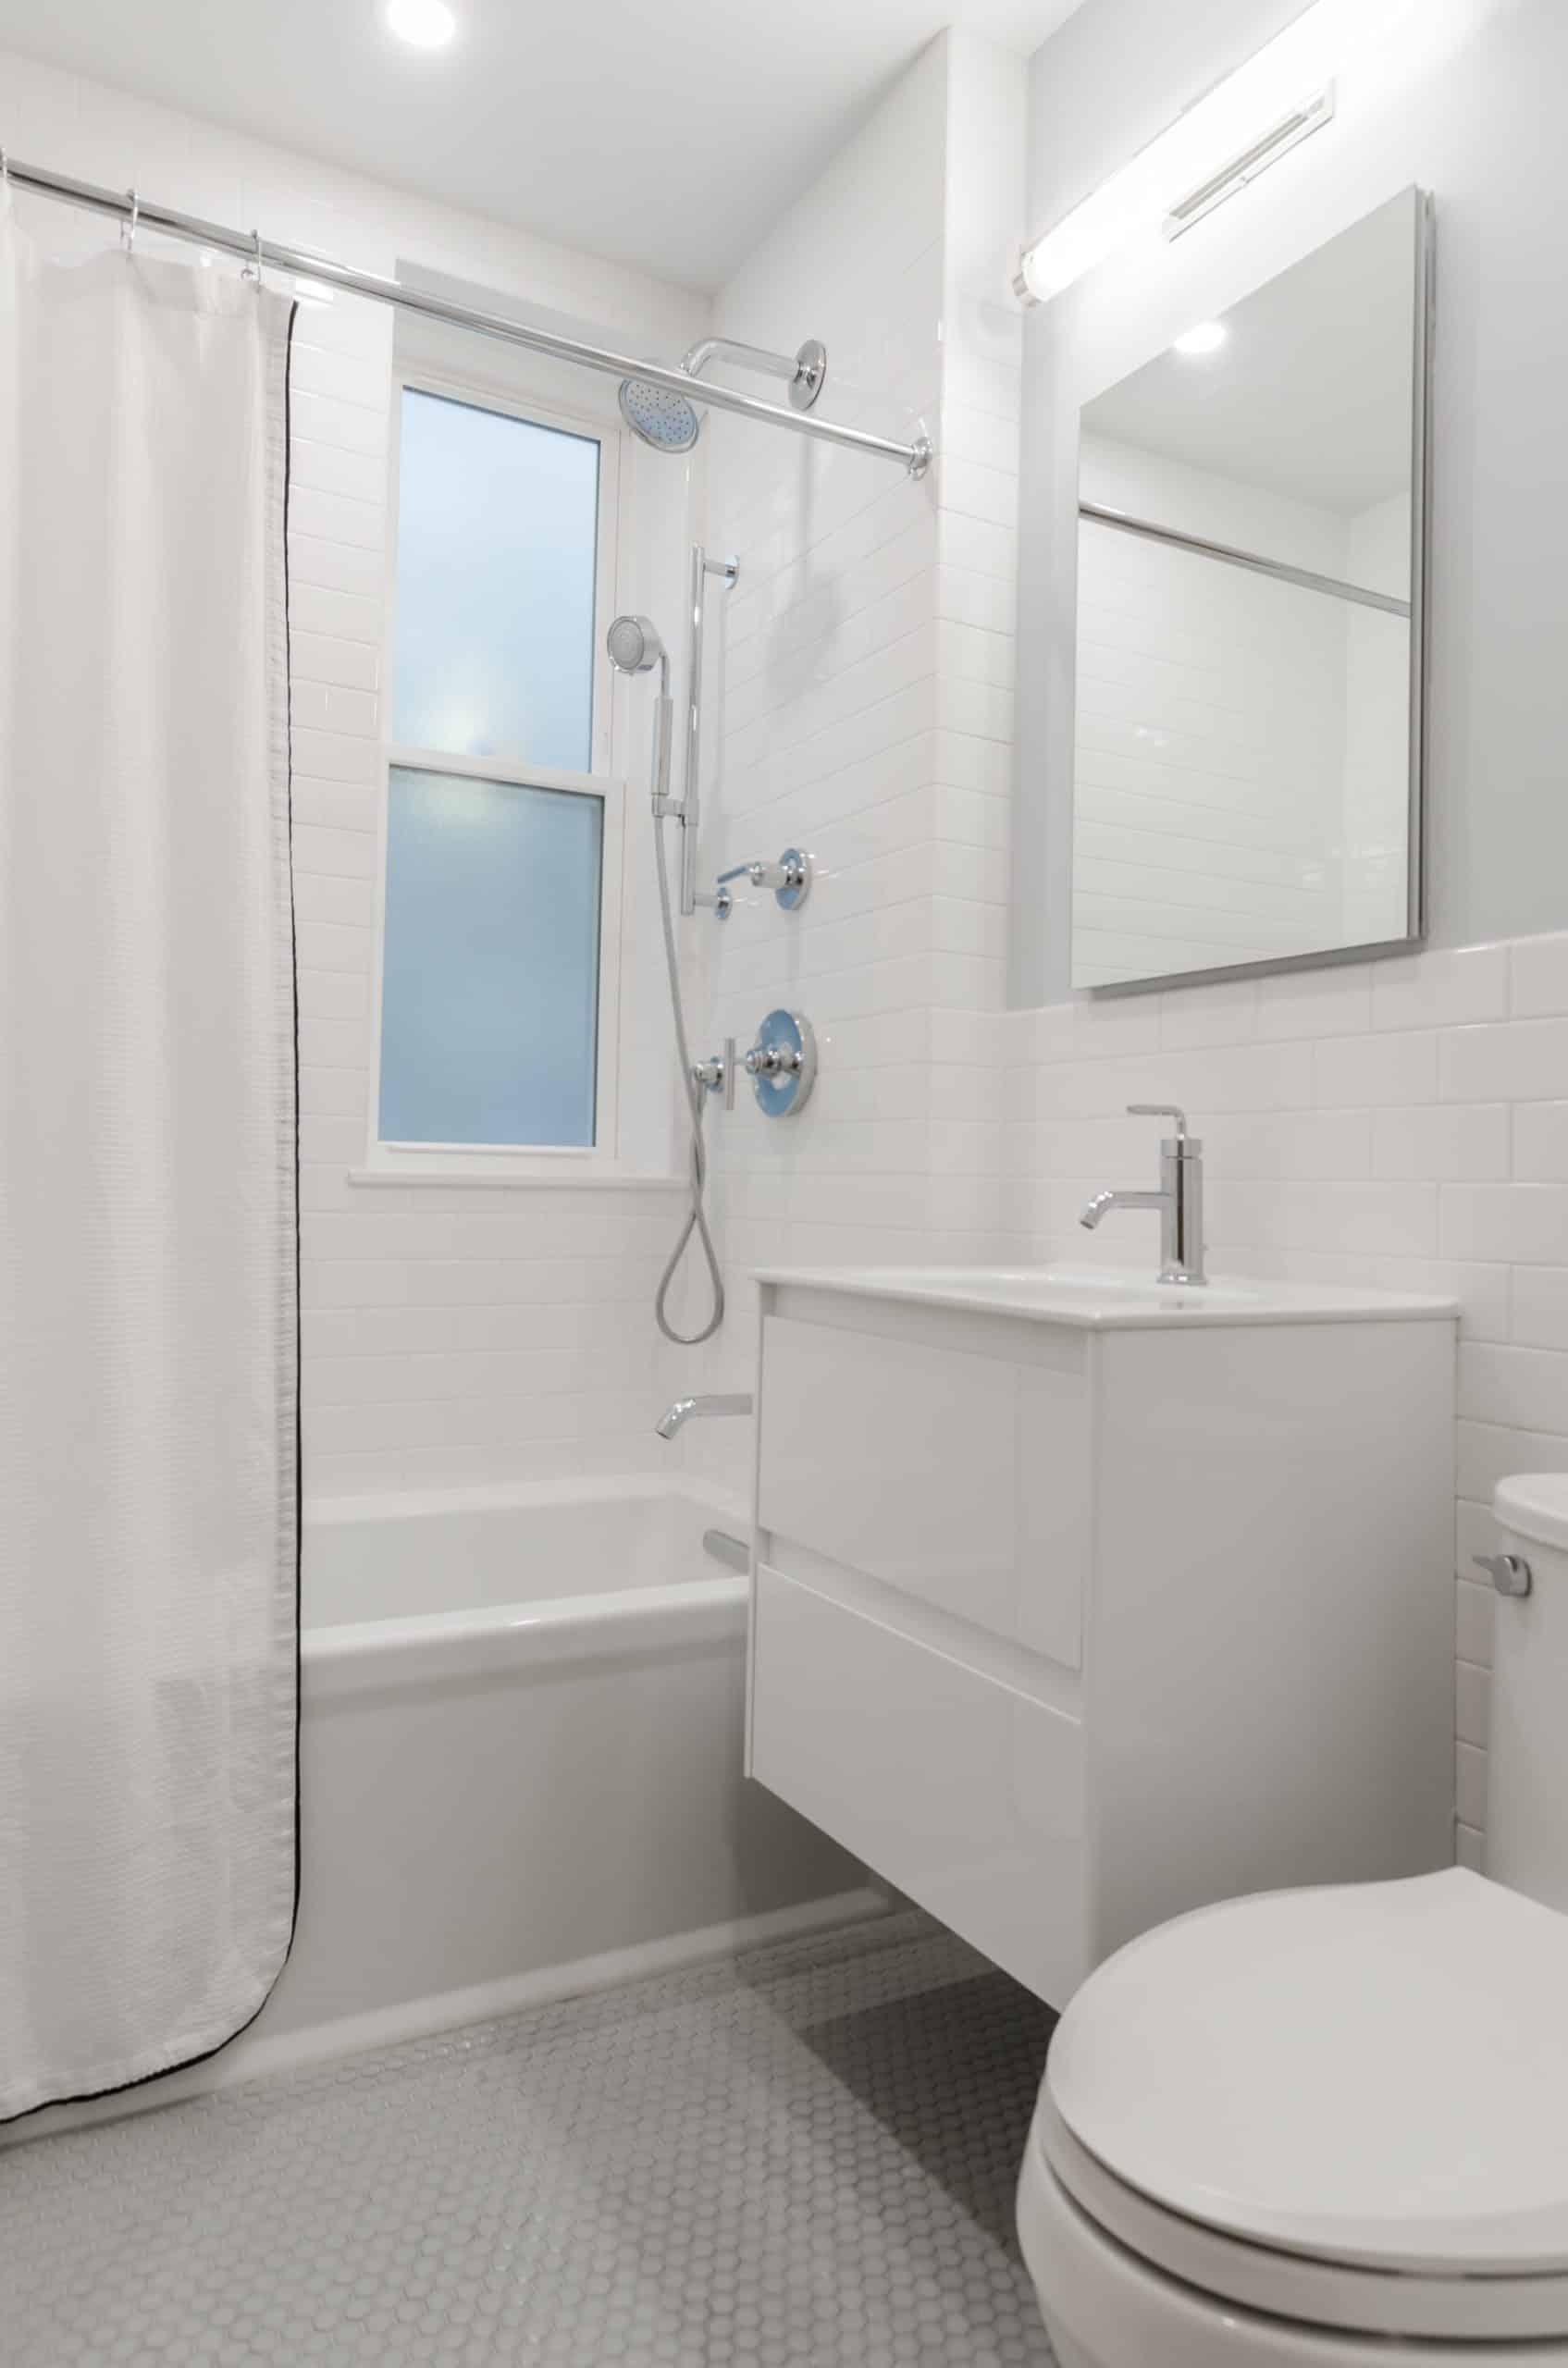 Bathroom Cleaning Hacks Article Image